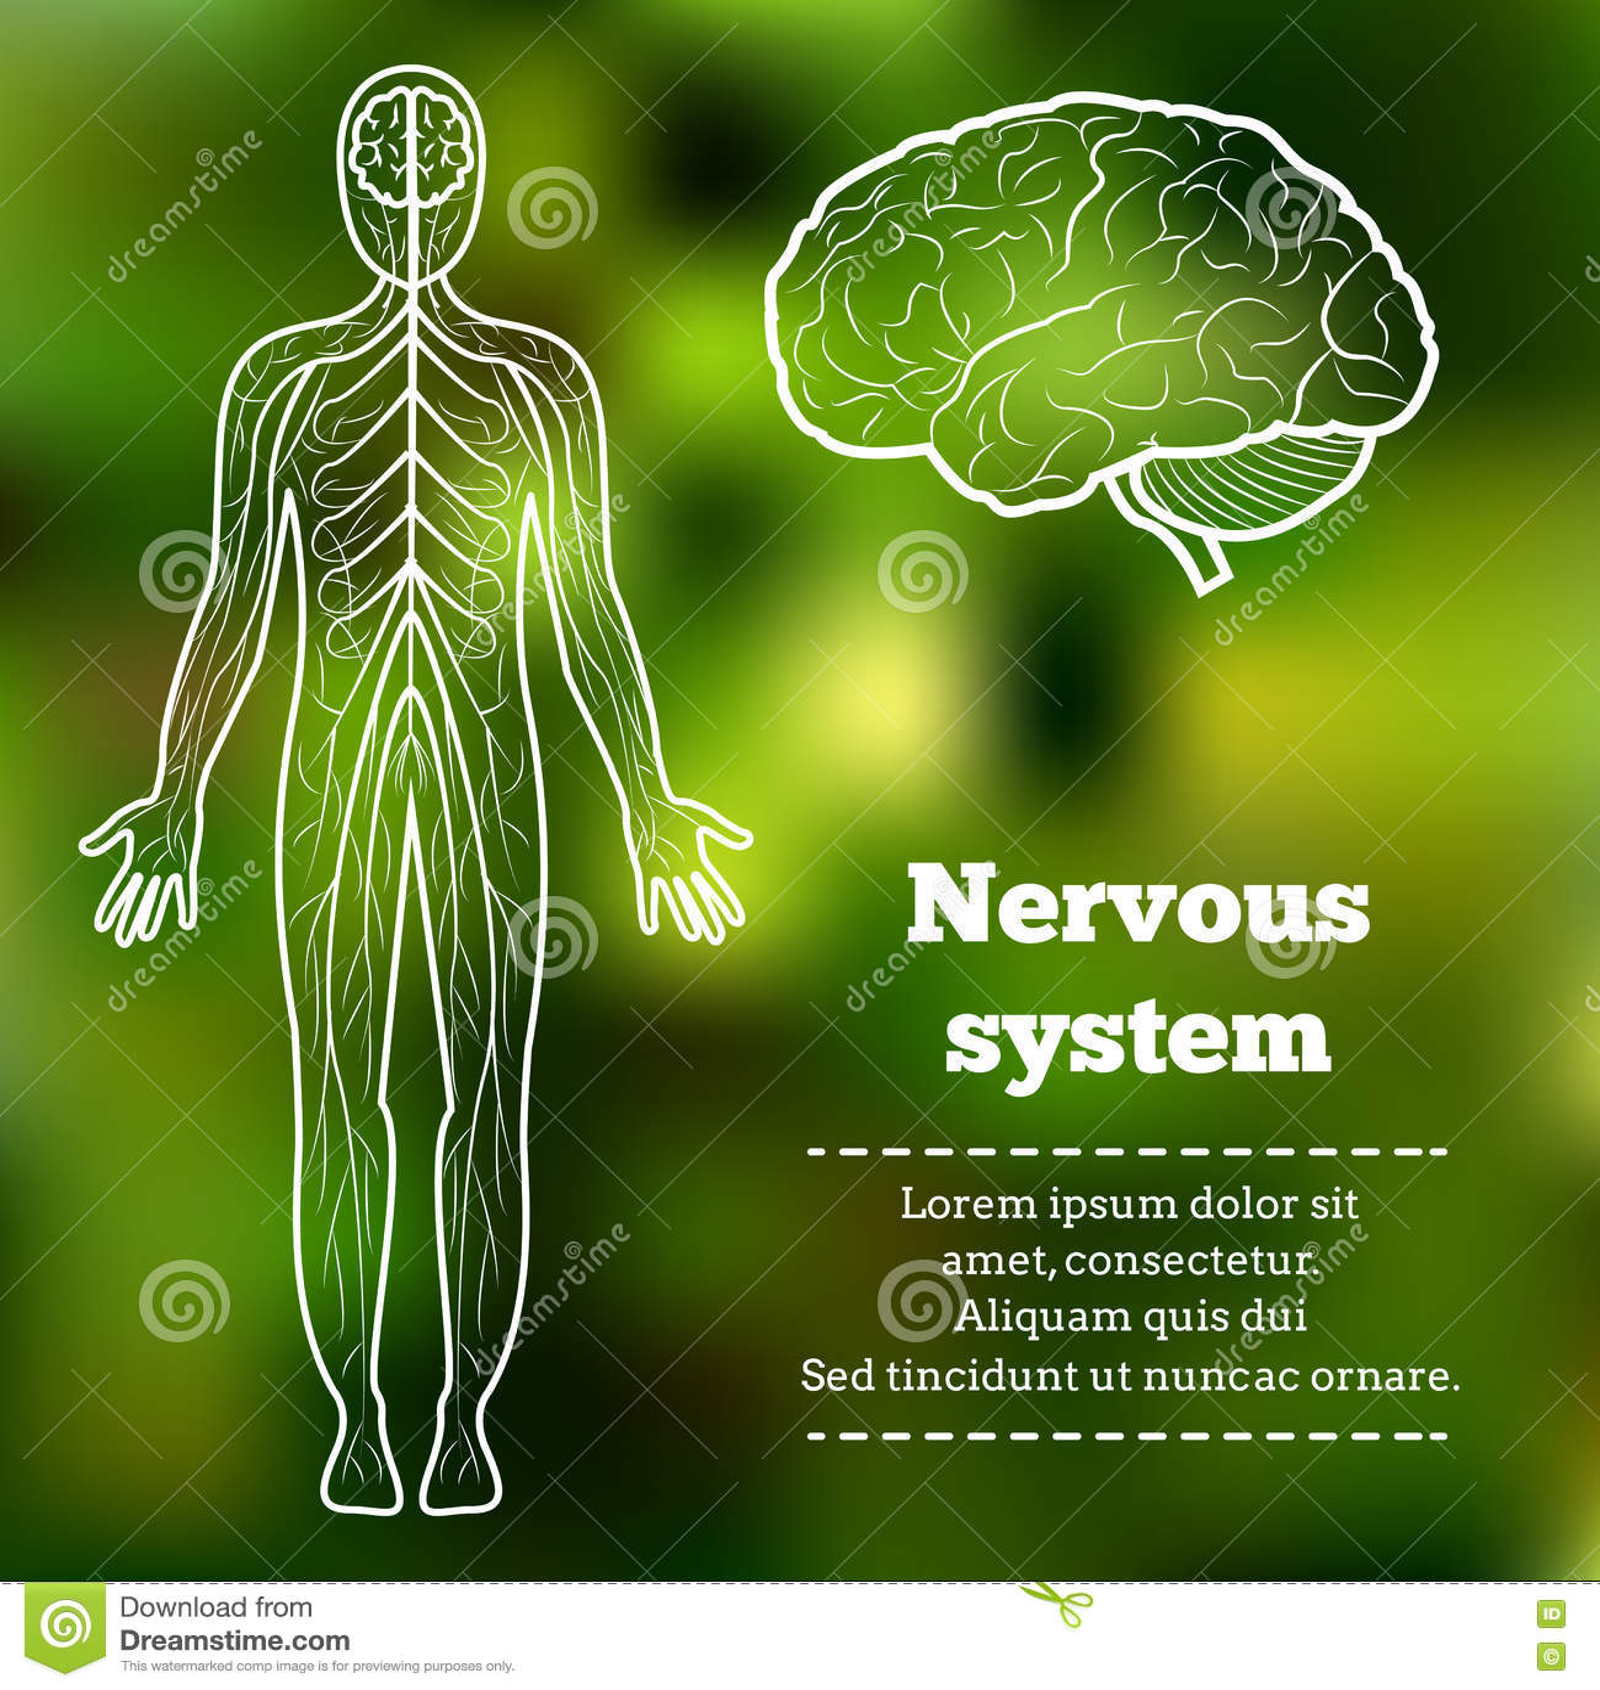 Human body nervous system stock vector. Illustration of sensory ...